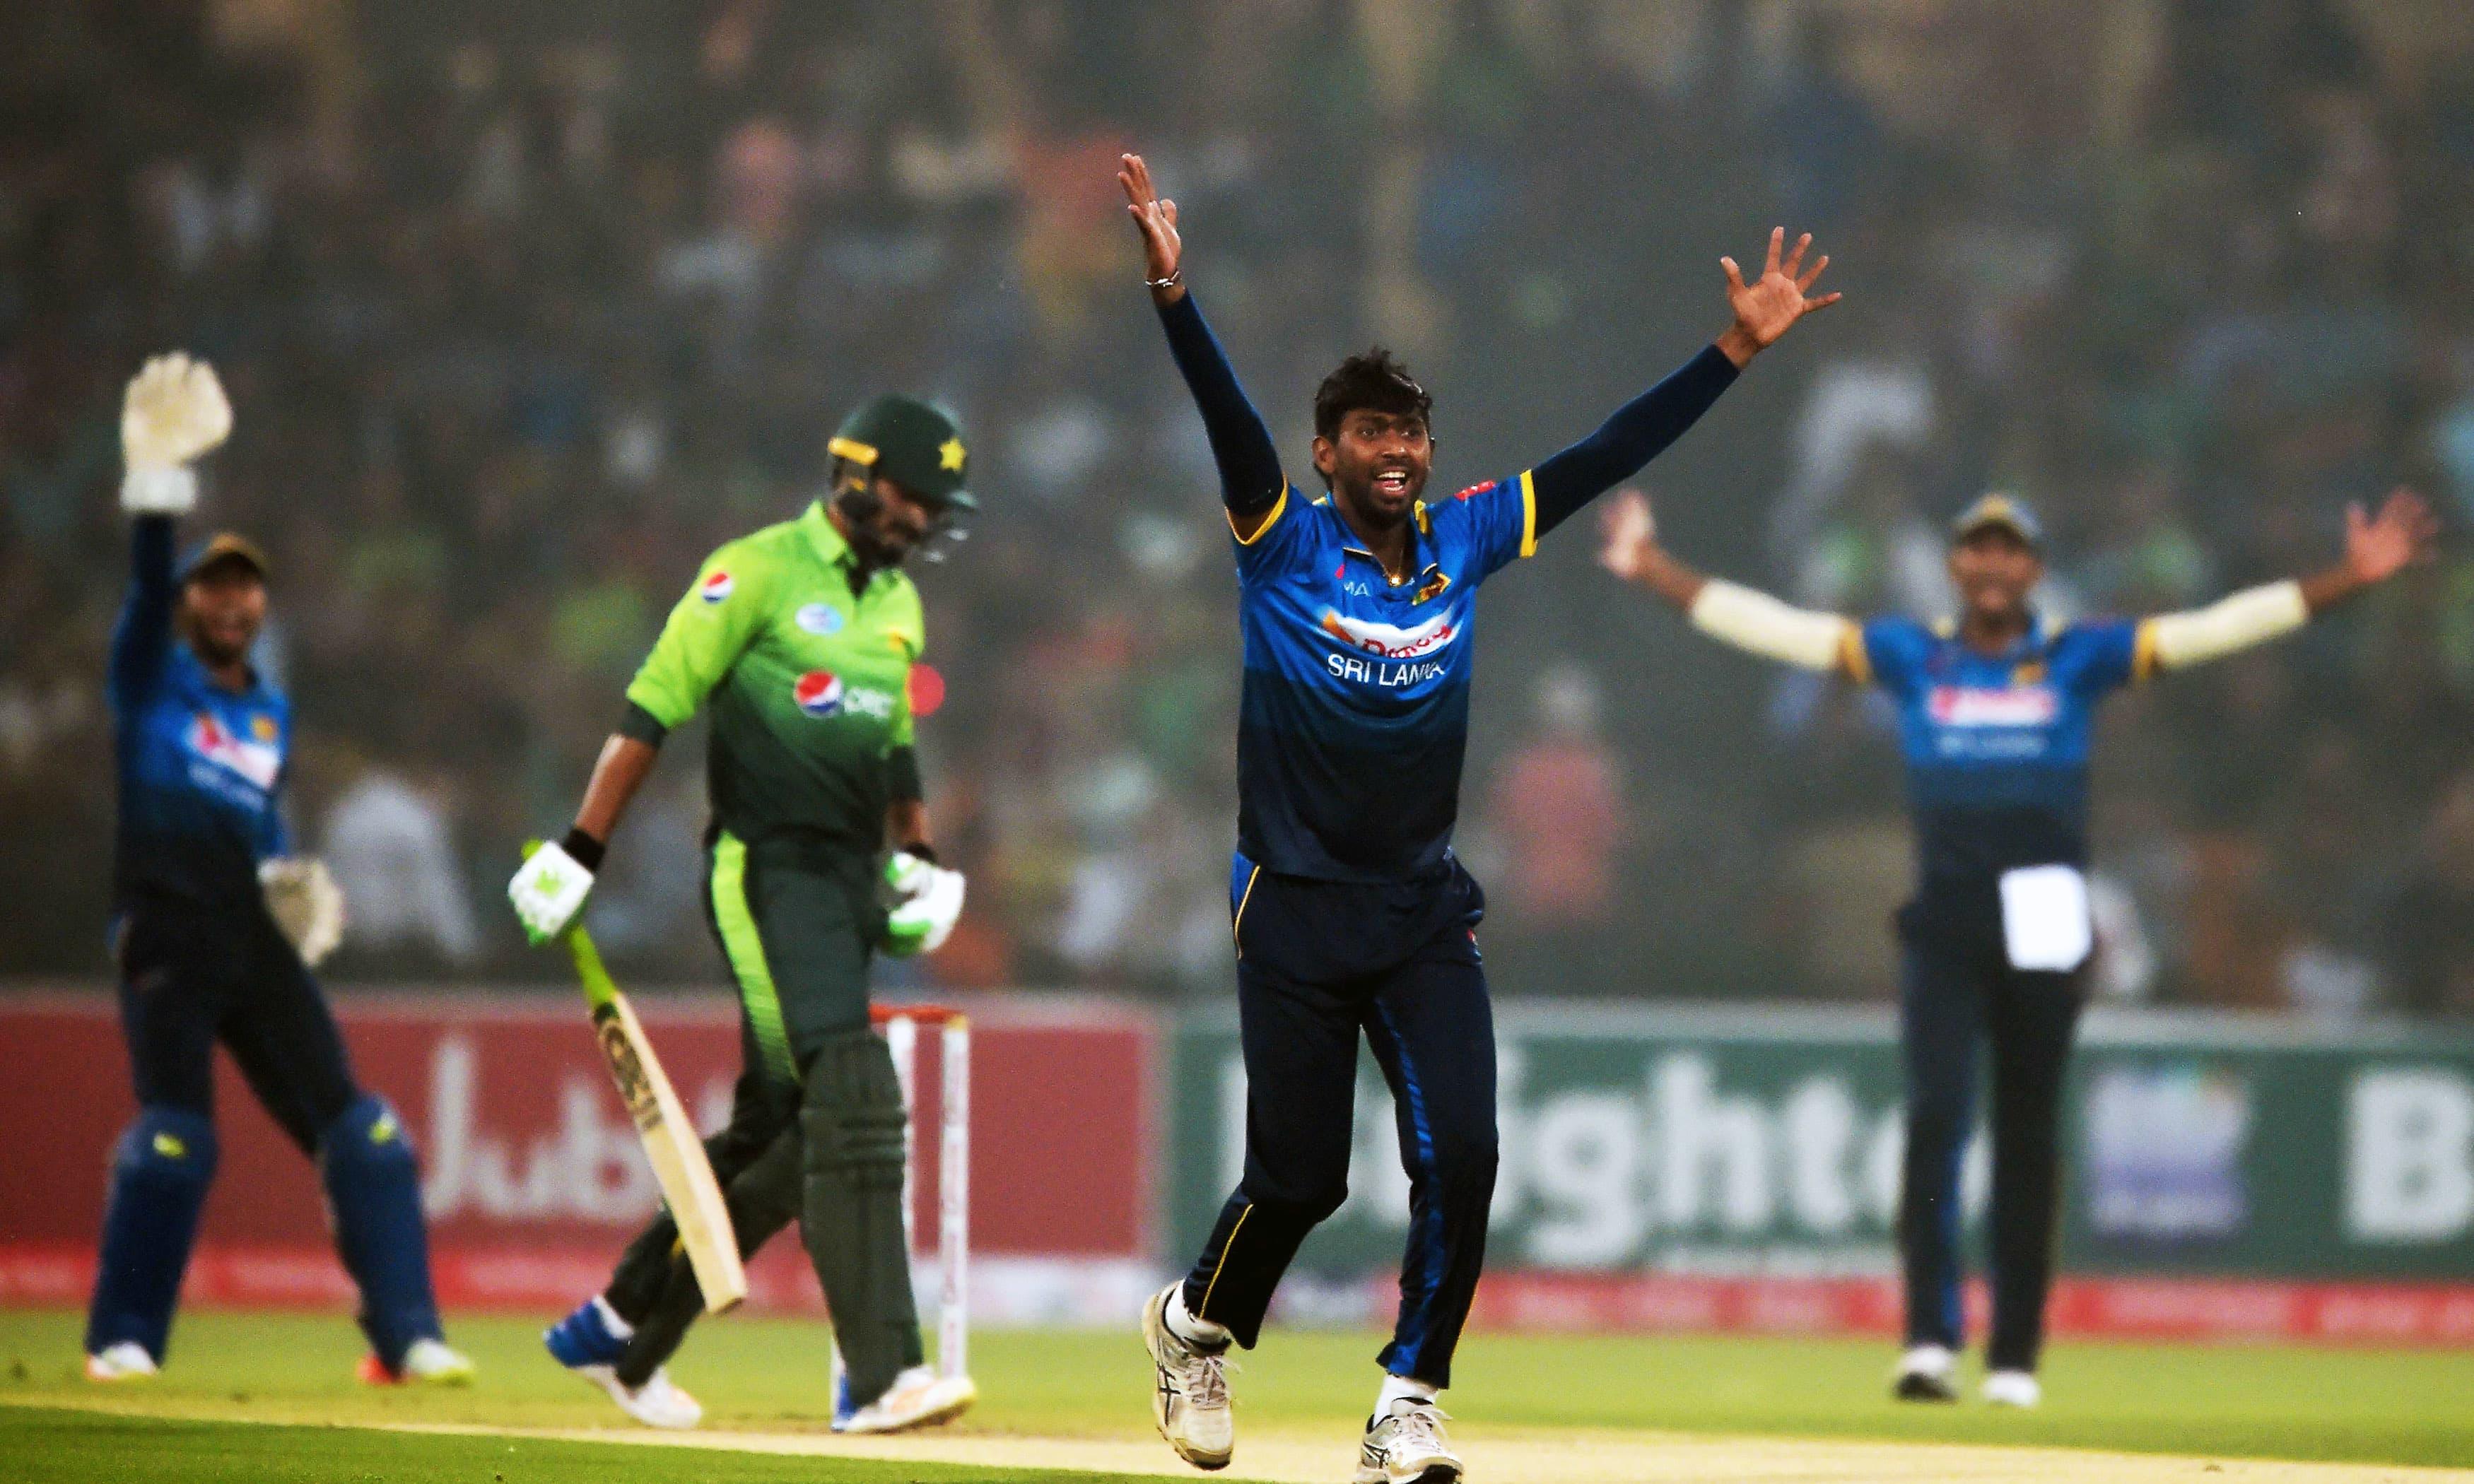 Vikum Sanjaya makes an unsuccessful leg before wicket appeal against Umar Amin. —AFP